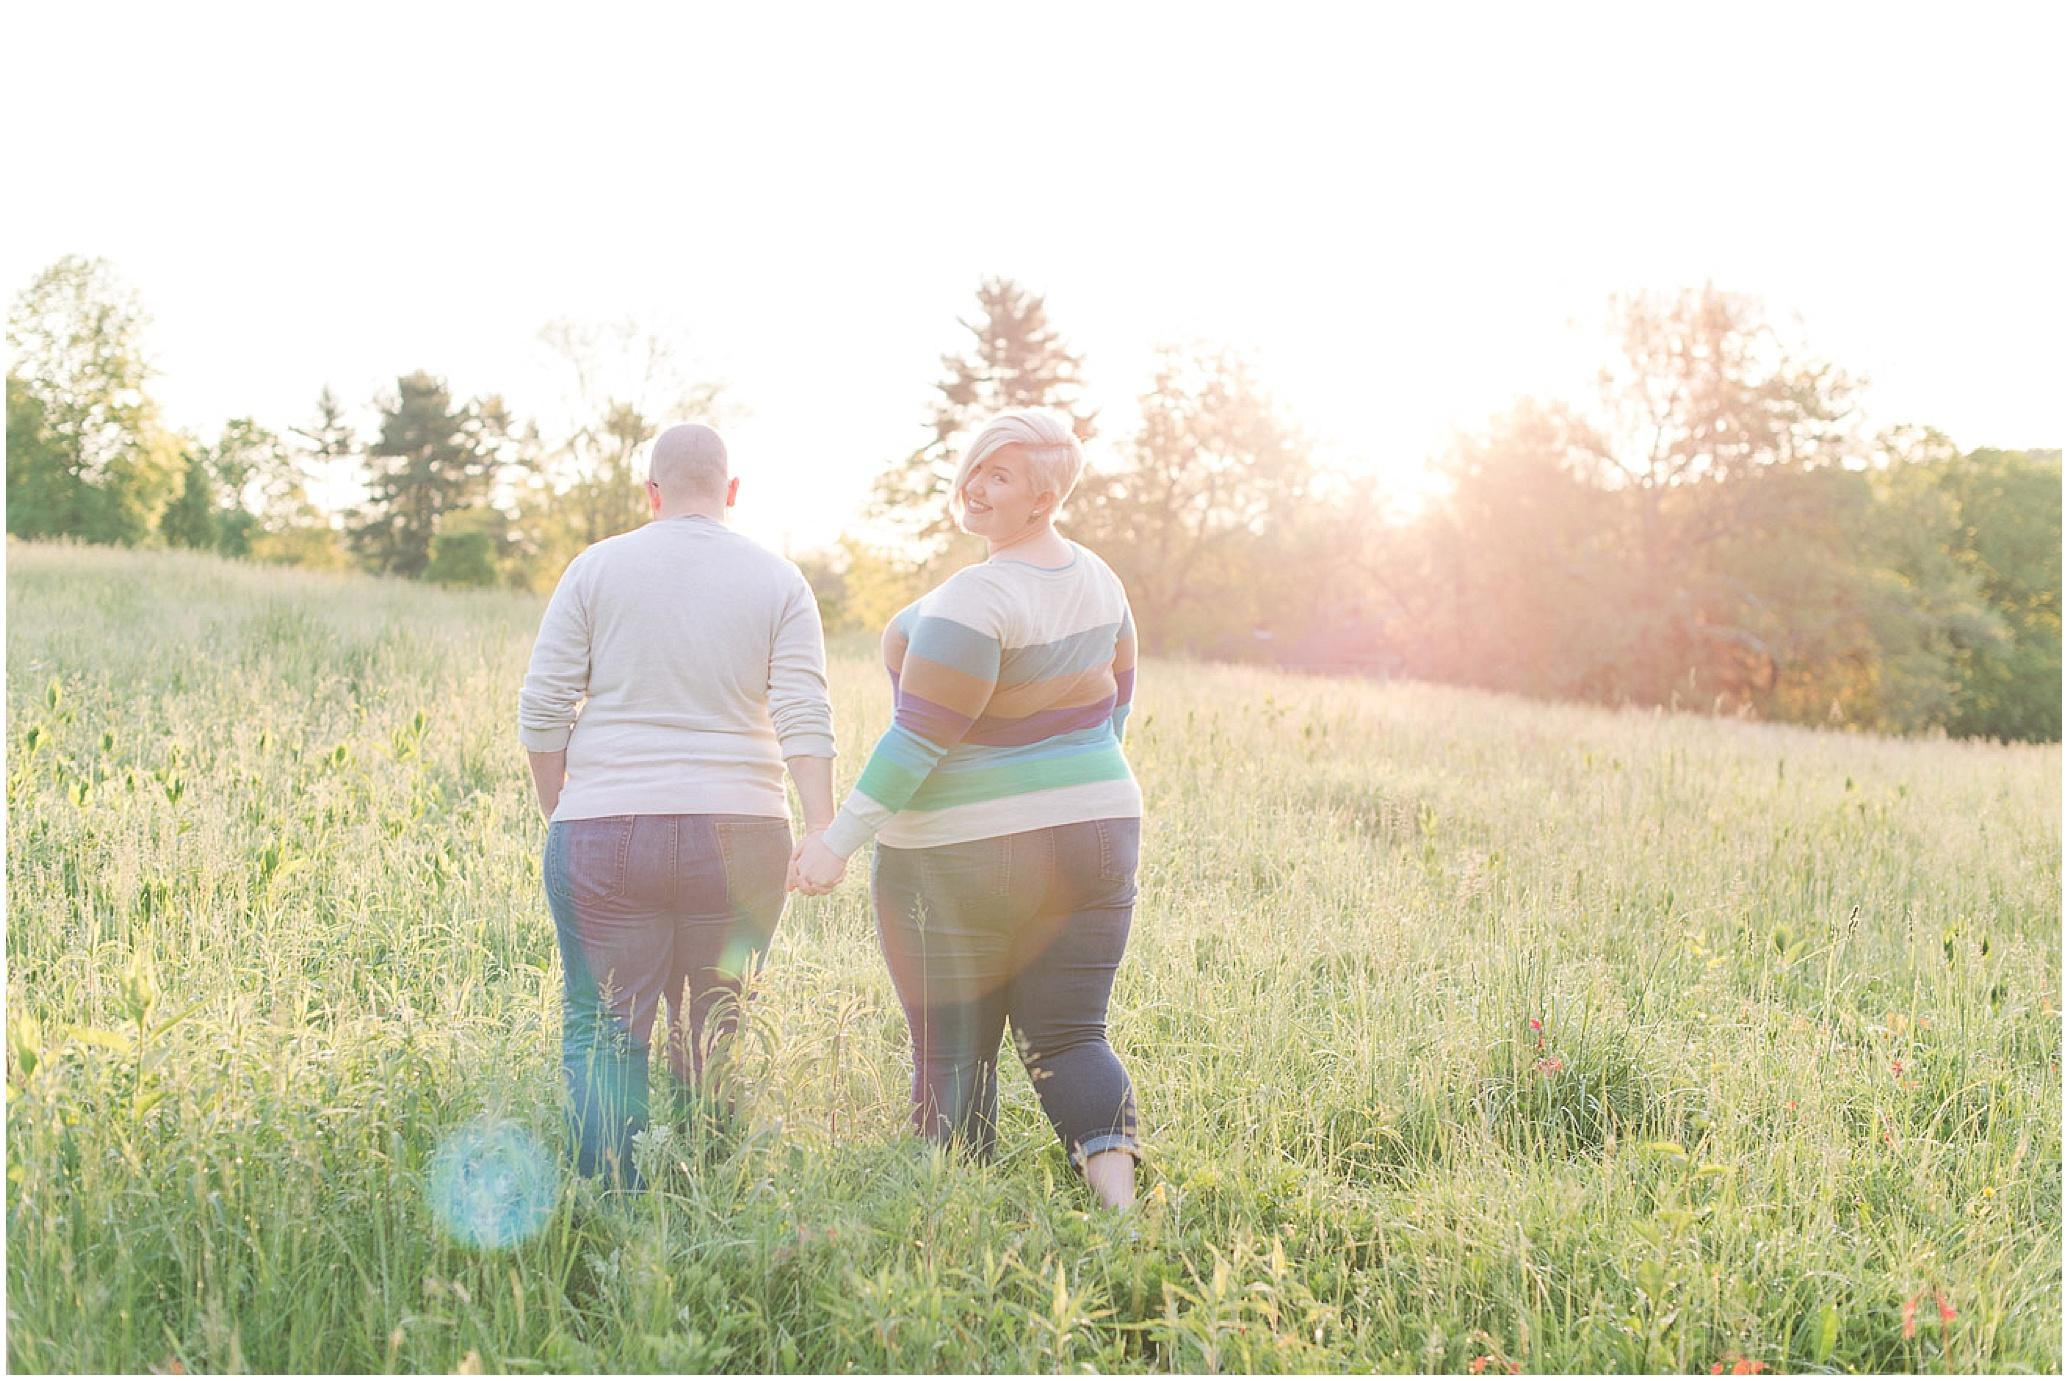 Hannah Leigh Photography Weddings and Engagements Baltimore Maryland_0008.jpg